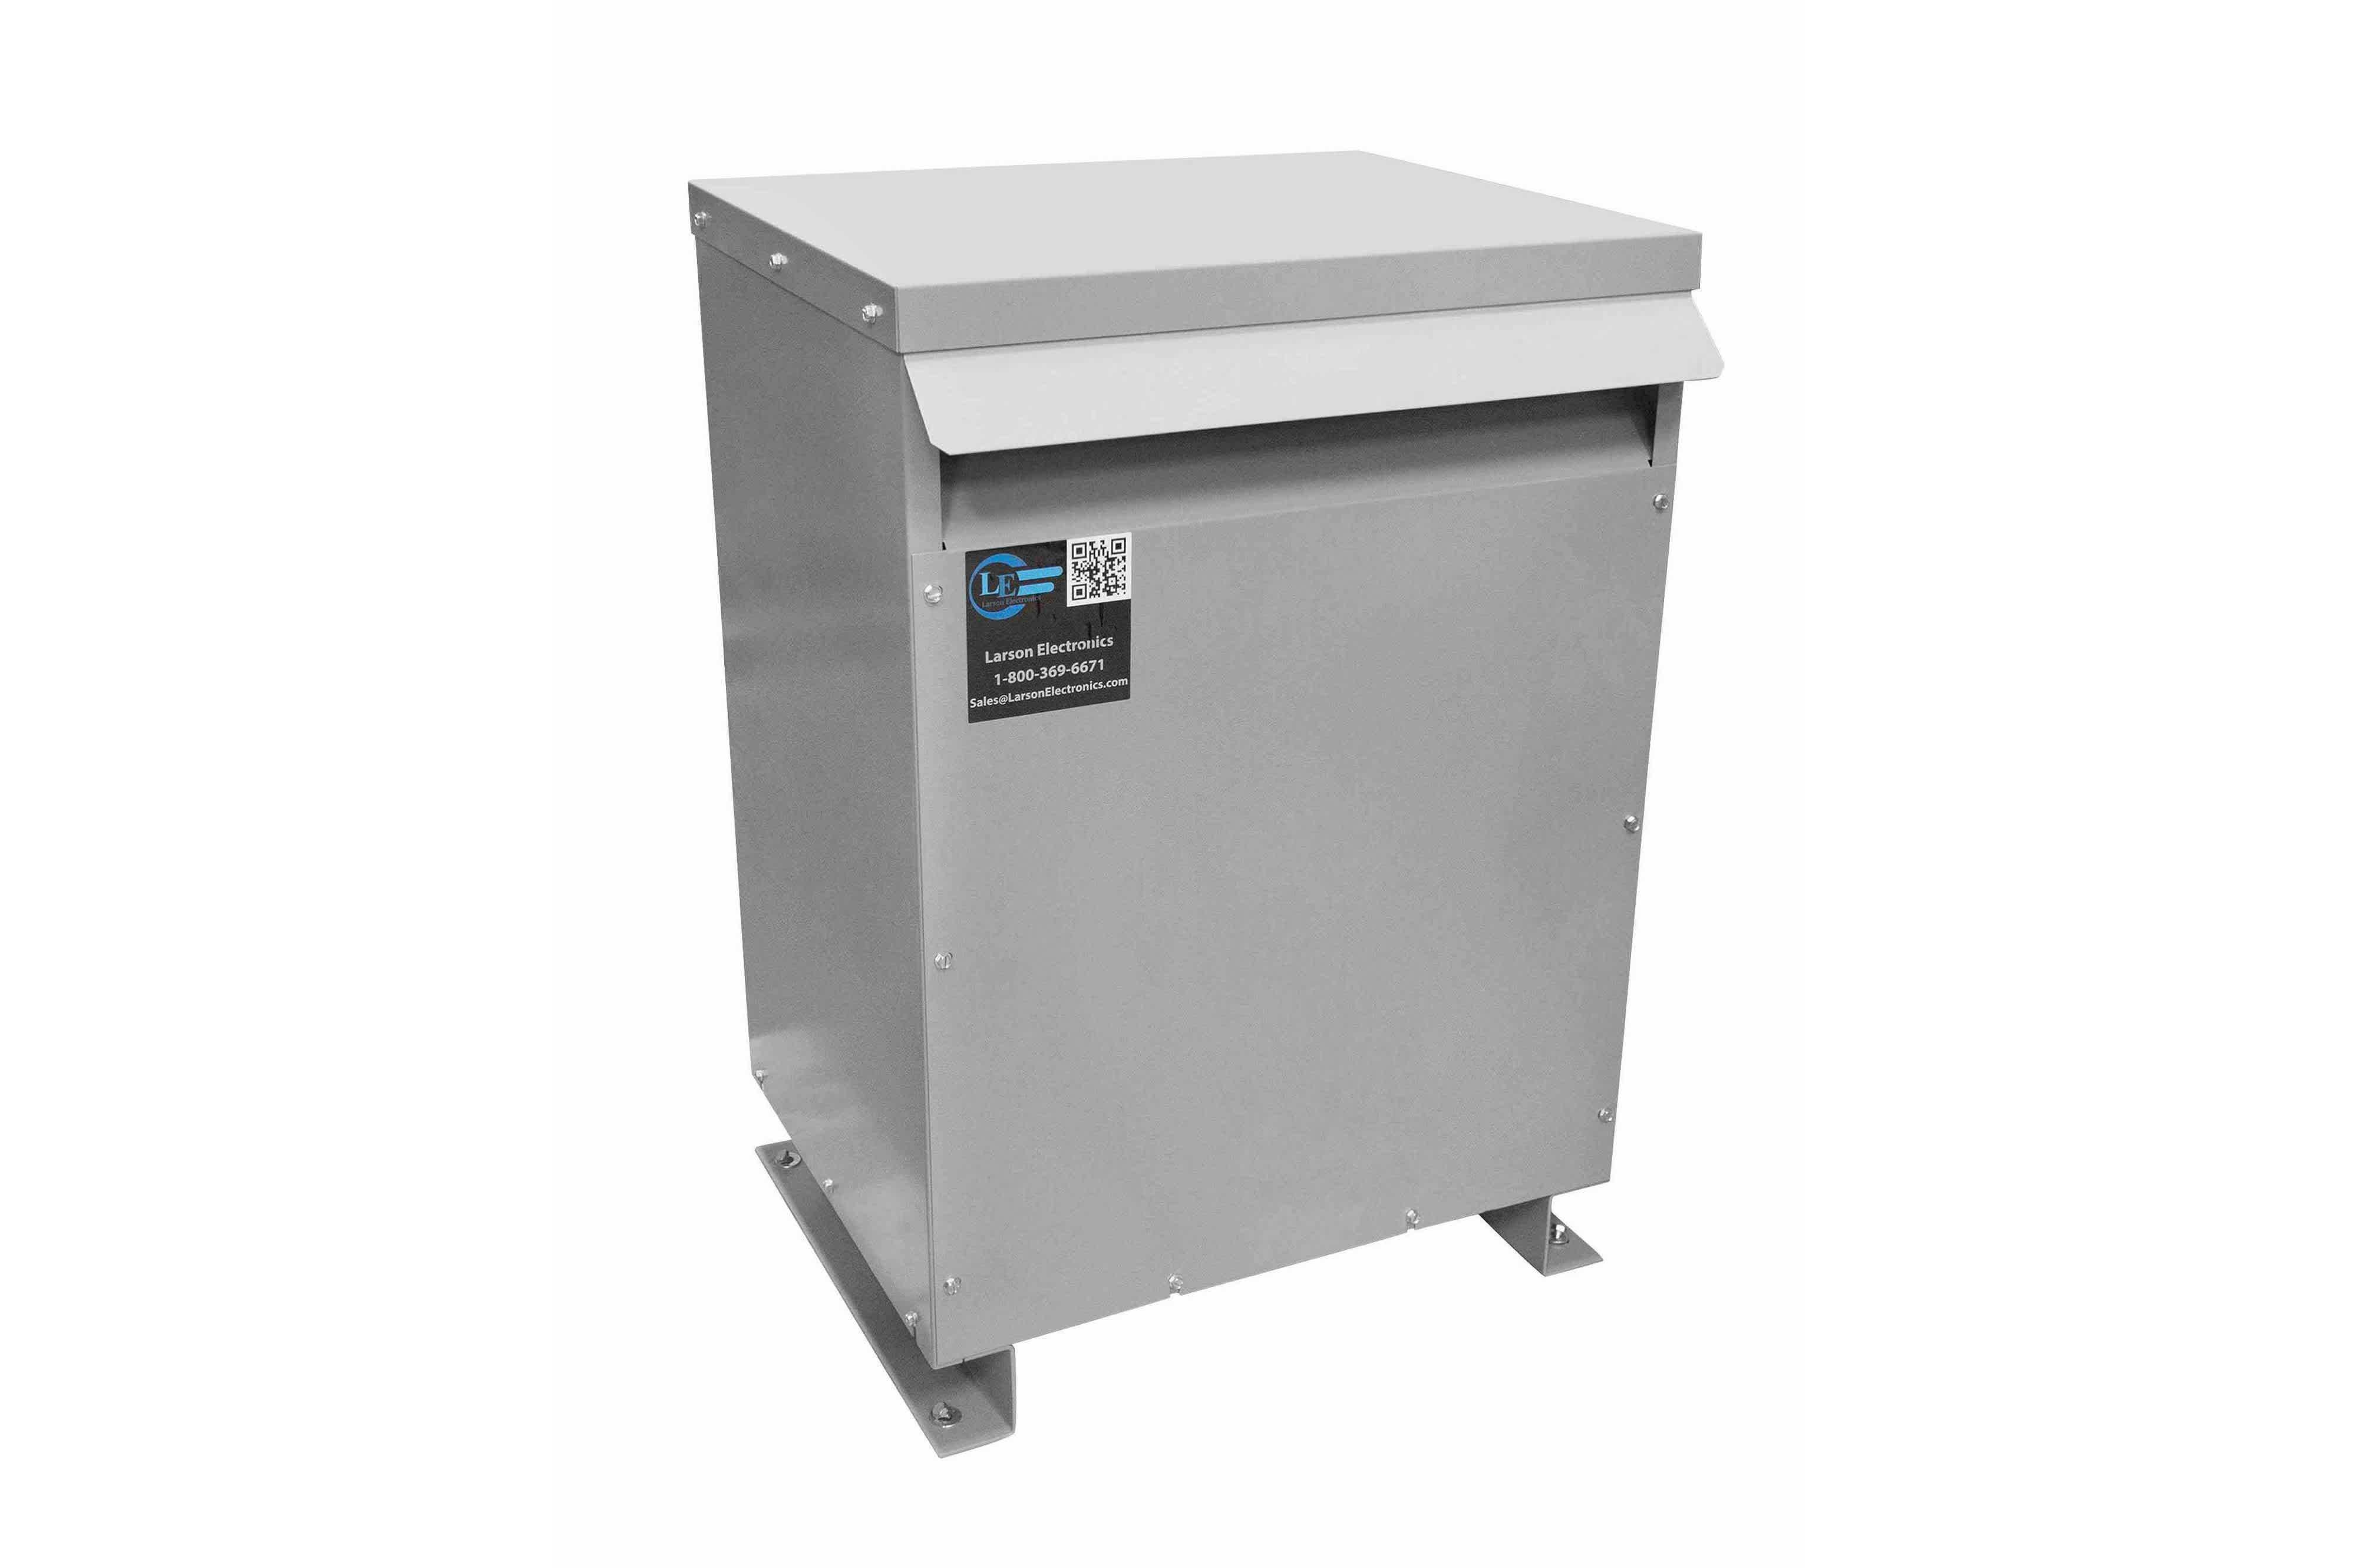 500 kVA 3PH Isolation Transformer, 575V Wye Primary, 480Y/277 Wye-N Secondary, N3R, Ventilated, 60 Hz